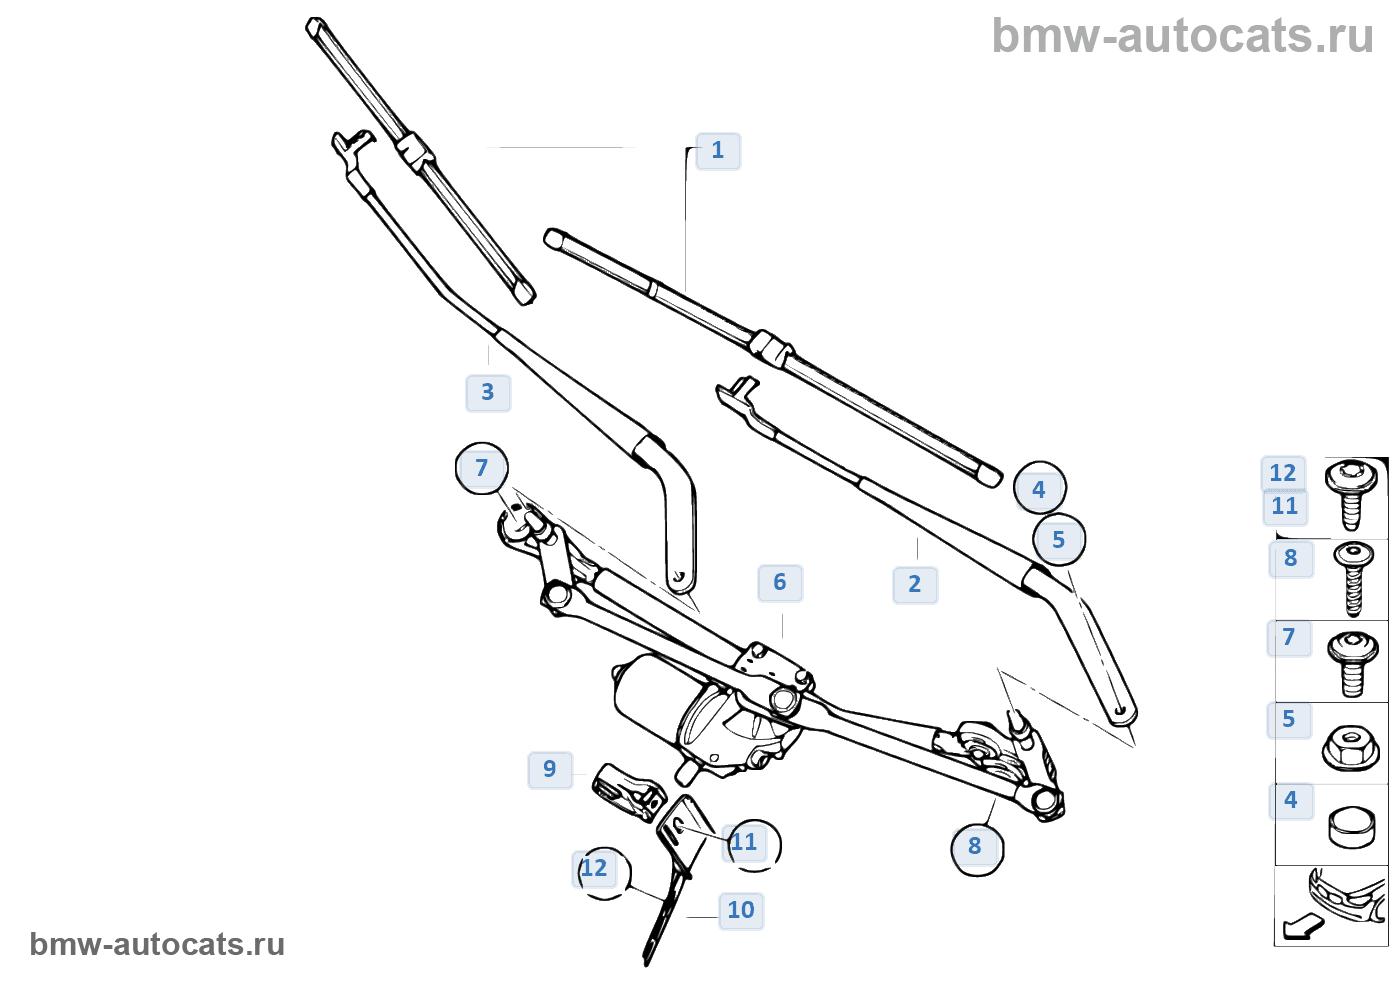 BMW x5 e53 размер щеток стеклоочистителя